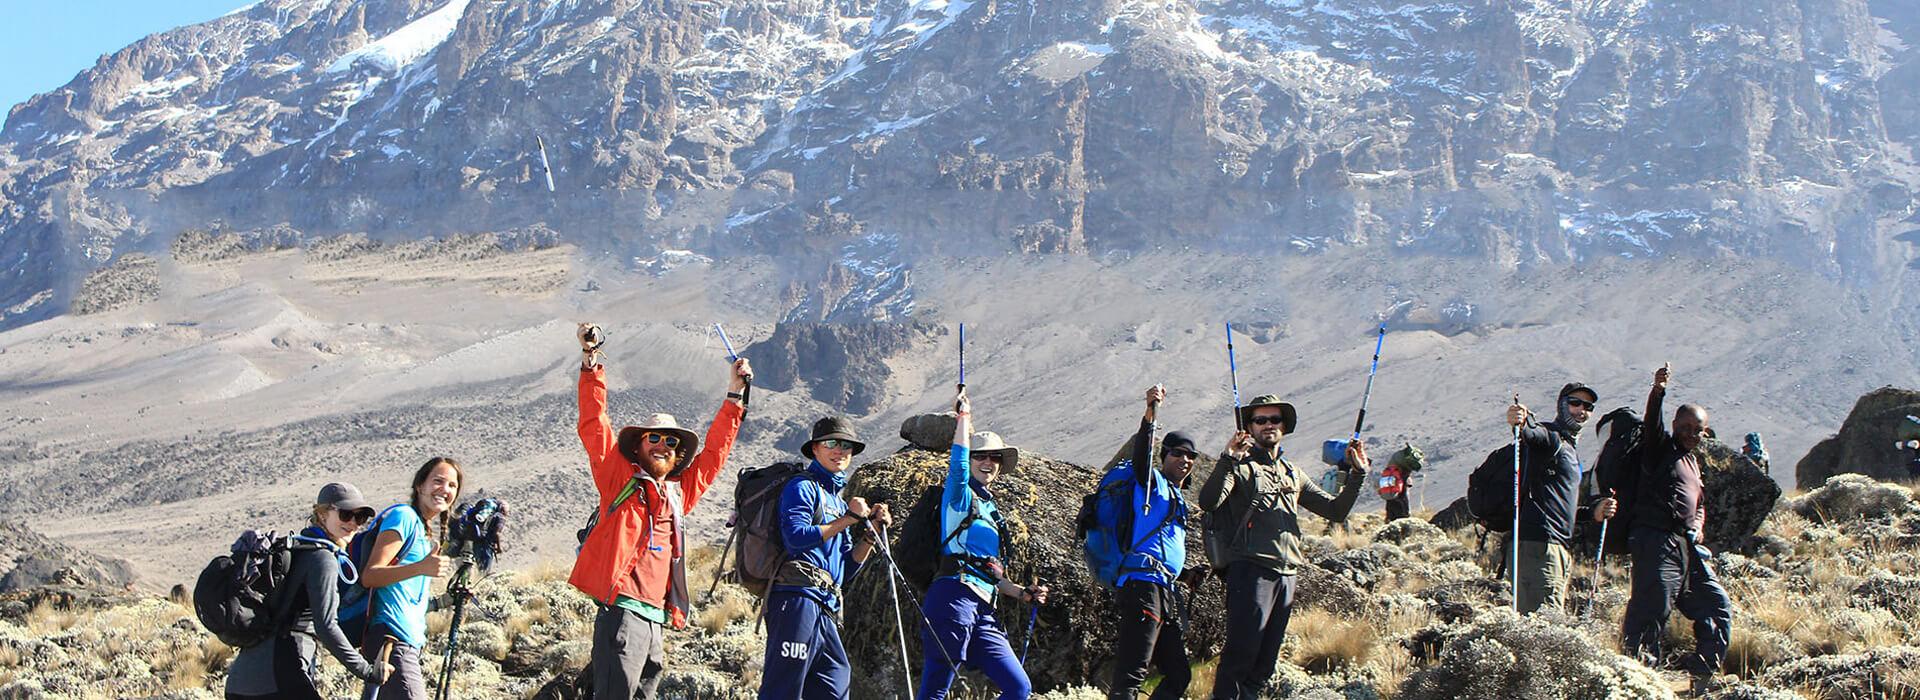 Best Time to Visit Kilimanjaro Banner